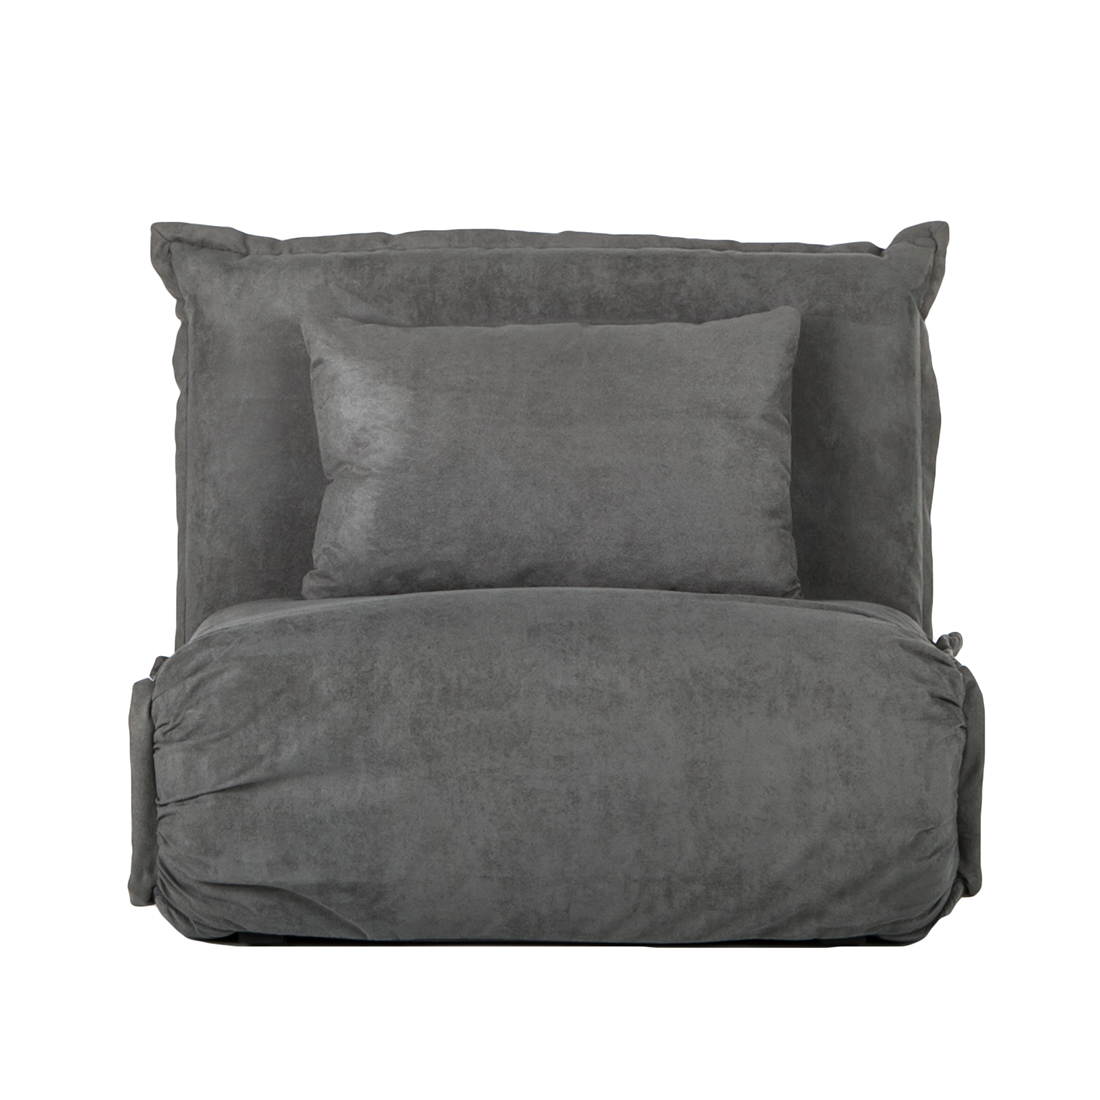 matratze sessel zum klappen sessel g stebett schlafsessel. Black Bedroom Furniture Sets. Home Design Ideas